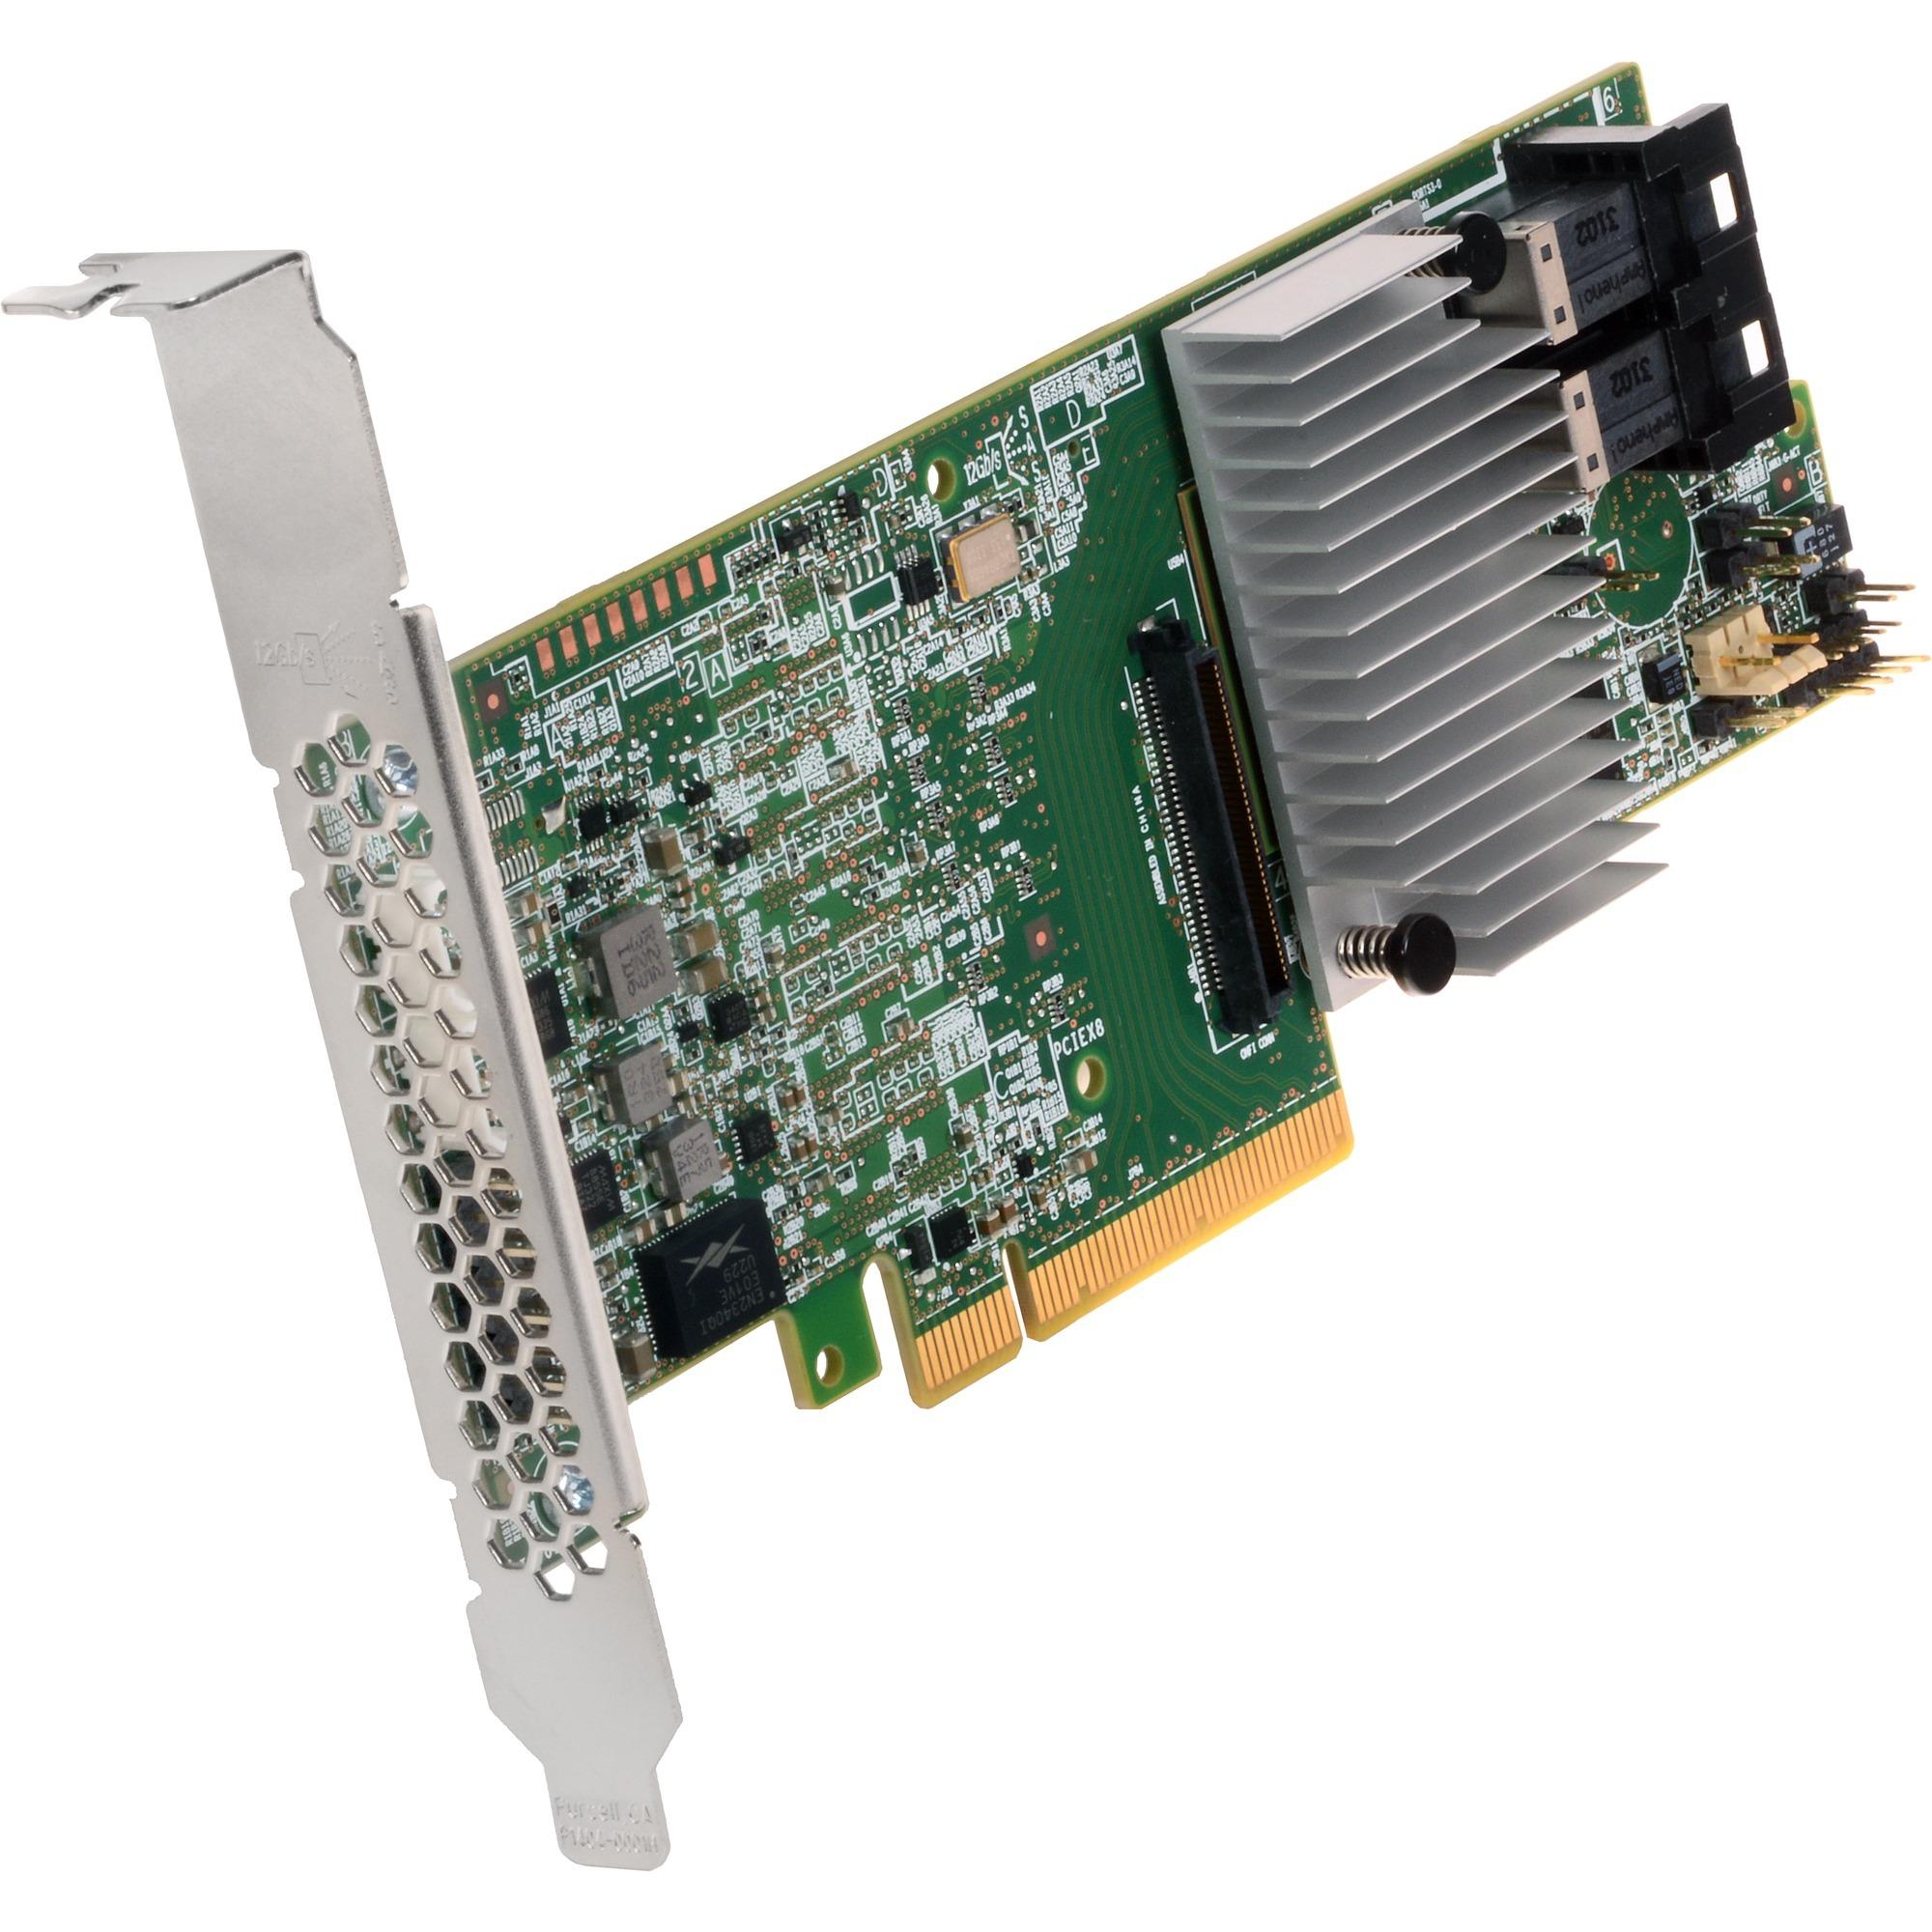 MegaRAID SAS 9361-8i controlado RAID PCI Express x8 3.0 12 Gbit/s, Controlador